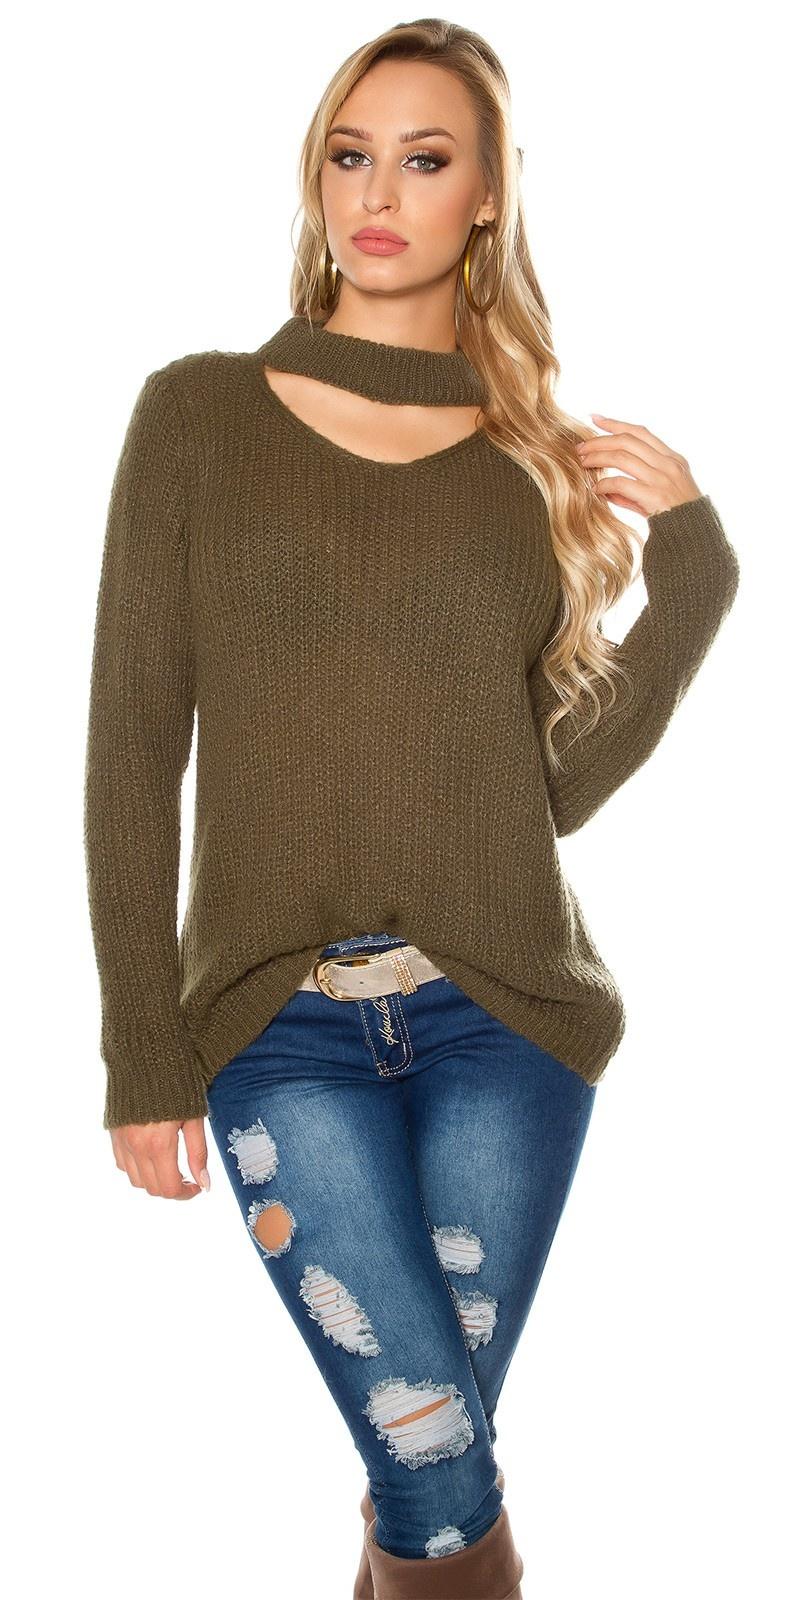 Trendy xl grof gebreide mohair sweater-trui met uitsparing khaki